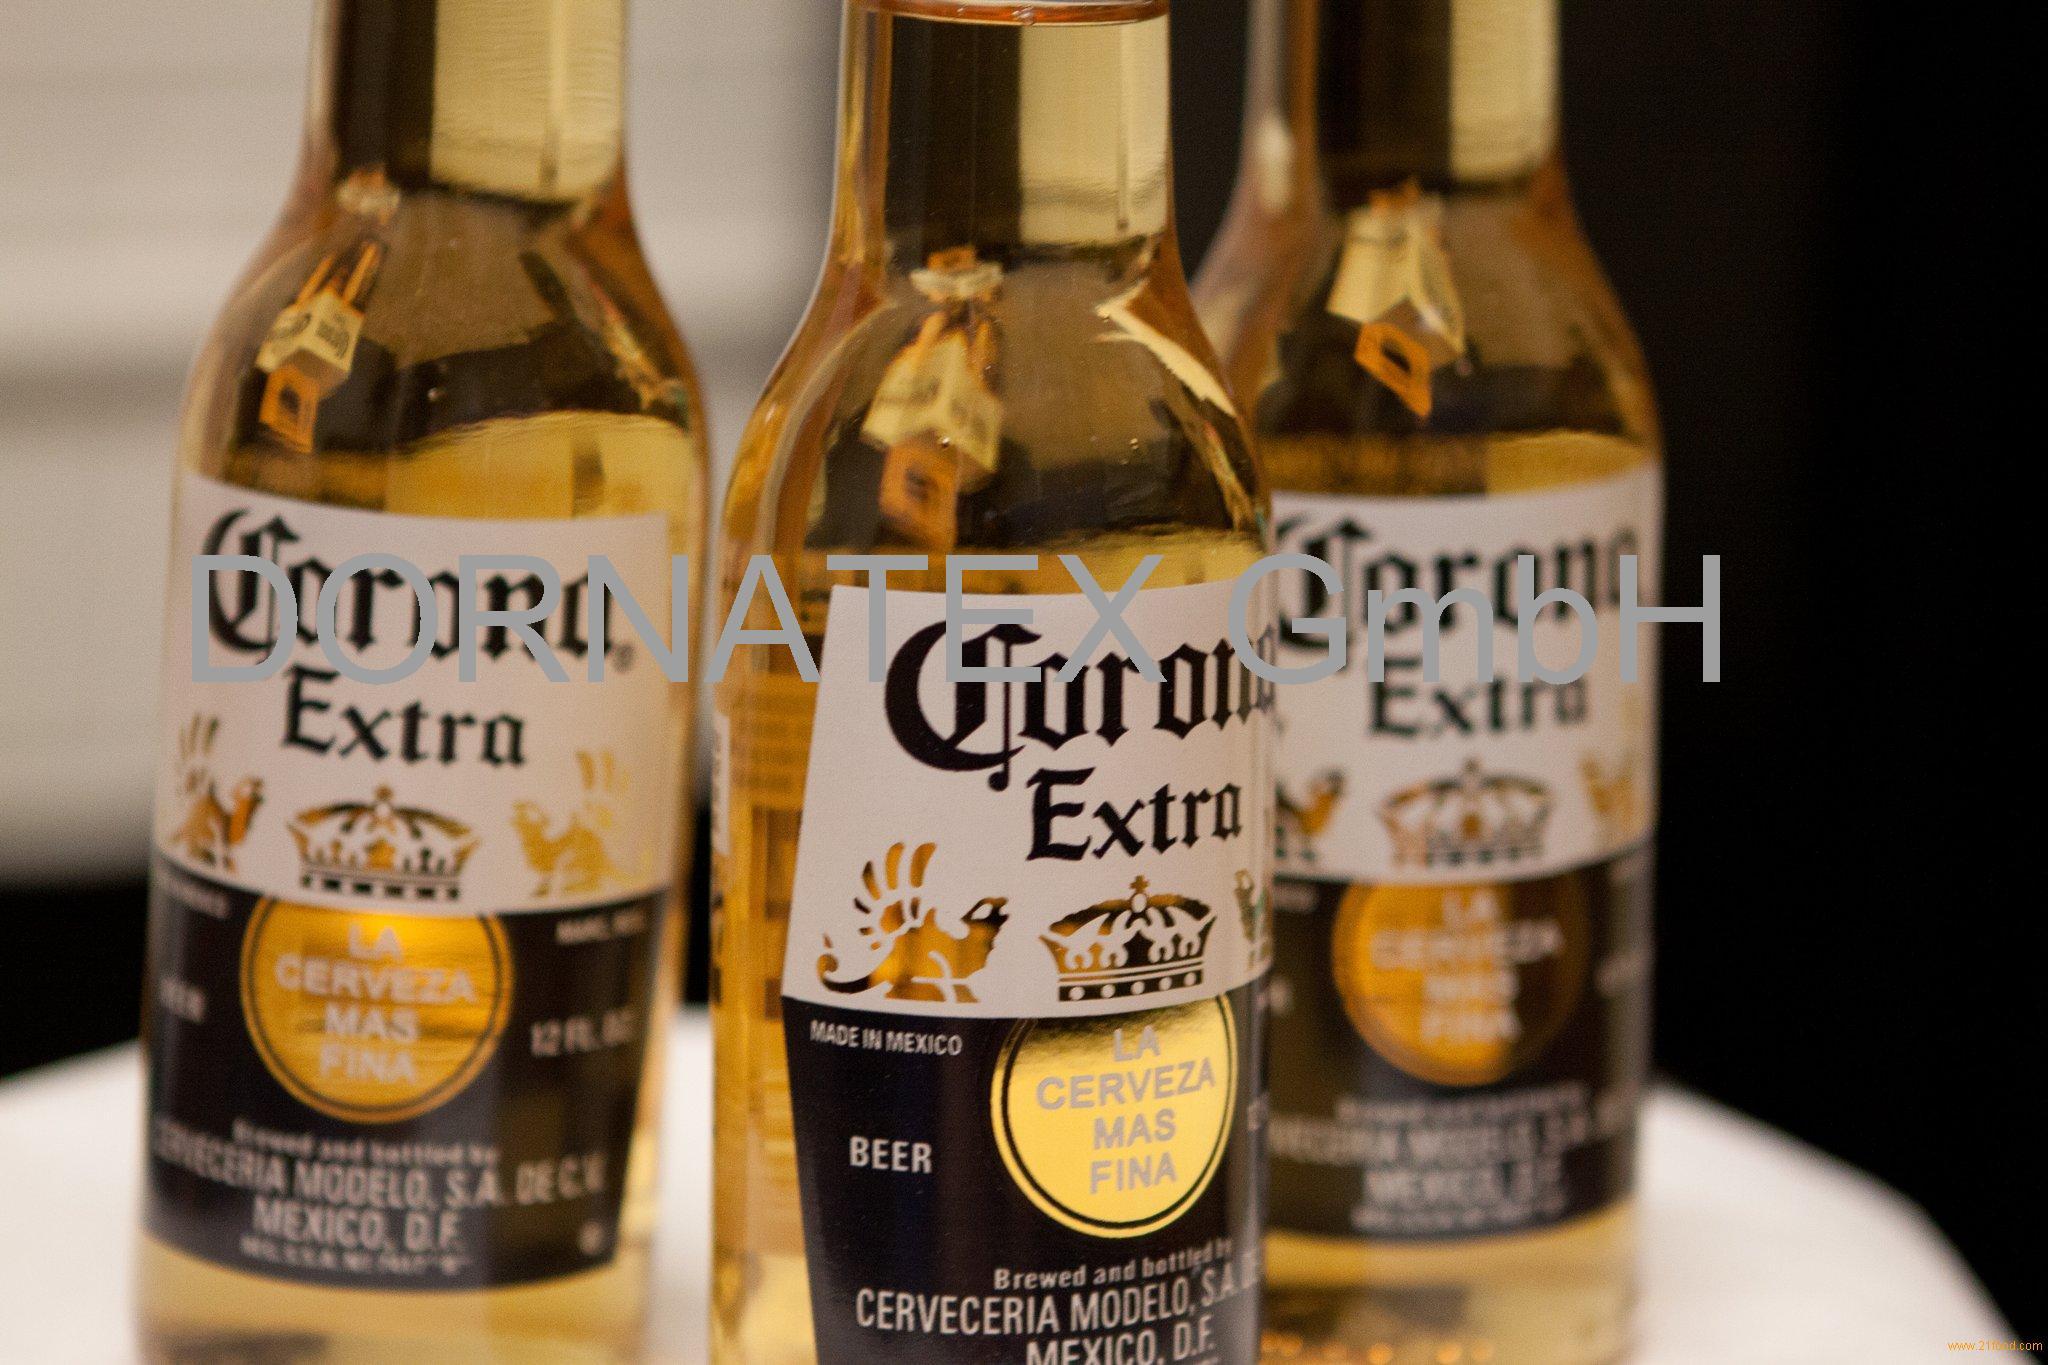 /Corona .Extra /330ml Bottle/ UK Origin/.